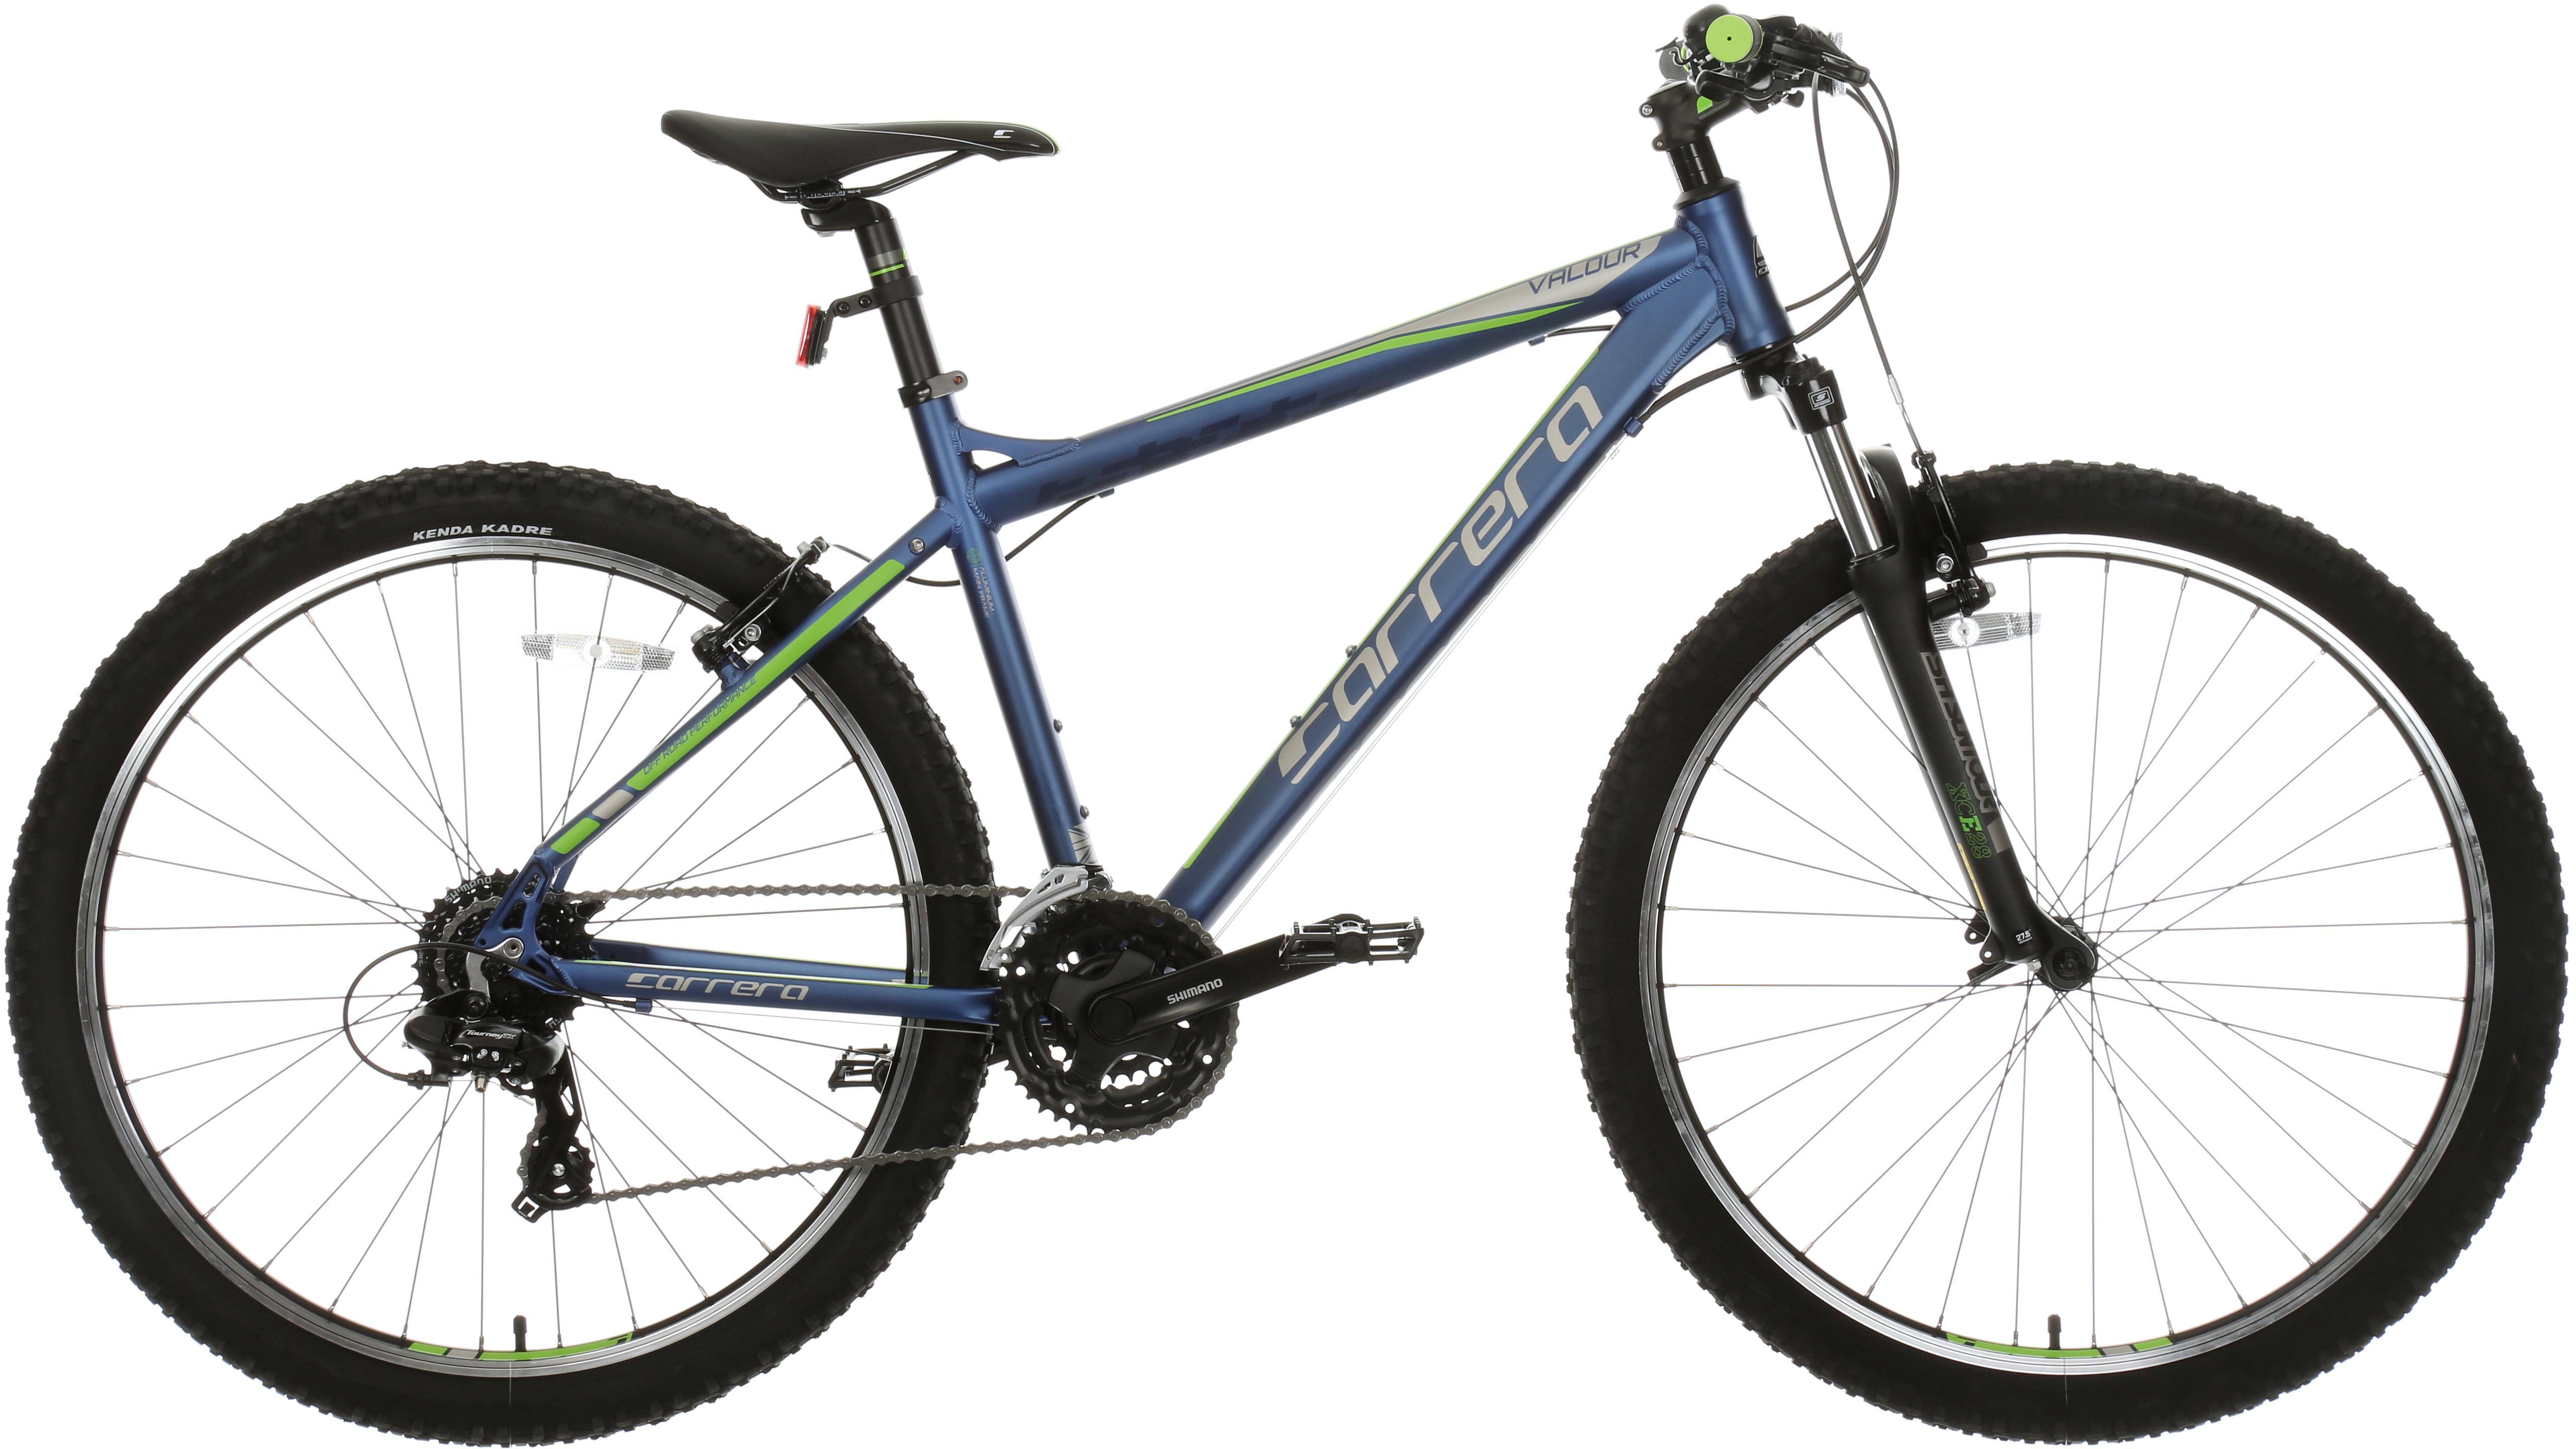 Carrera Valour Mens Mountain Bike - Large